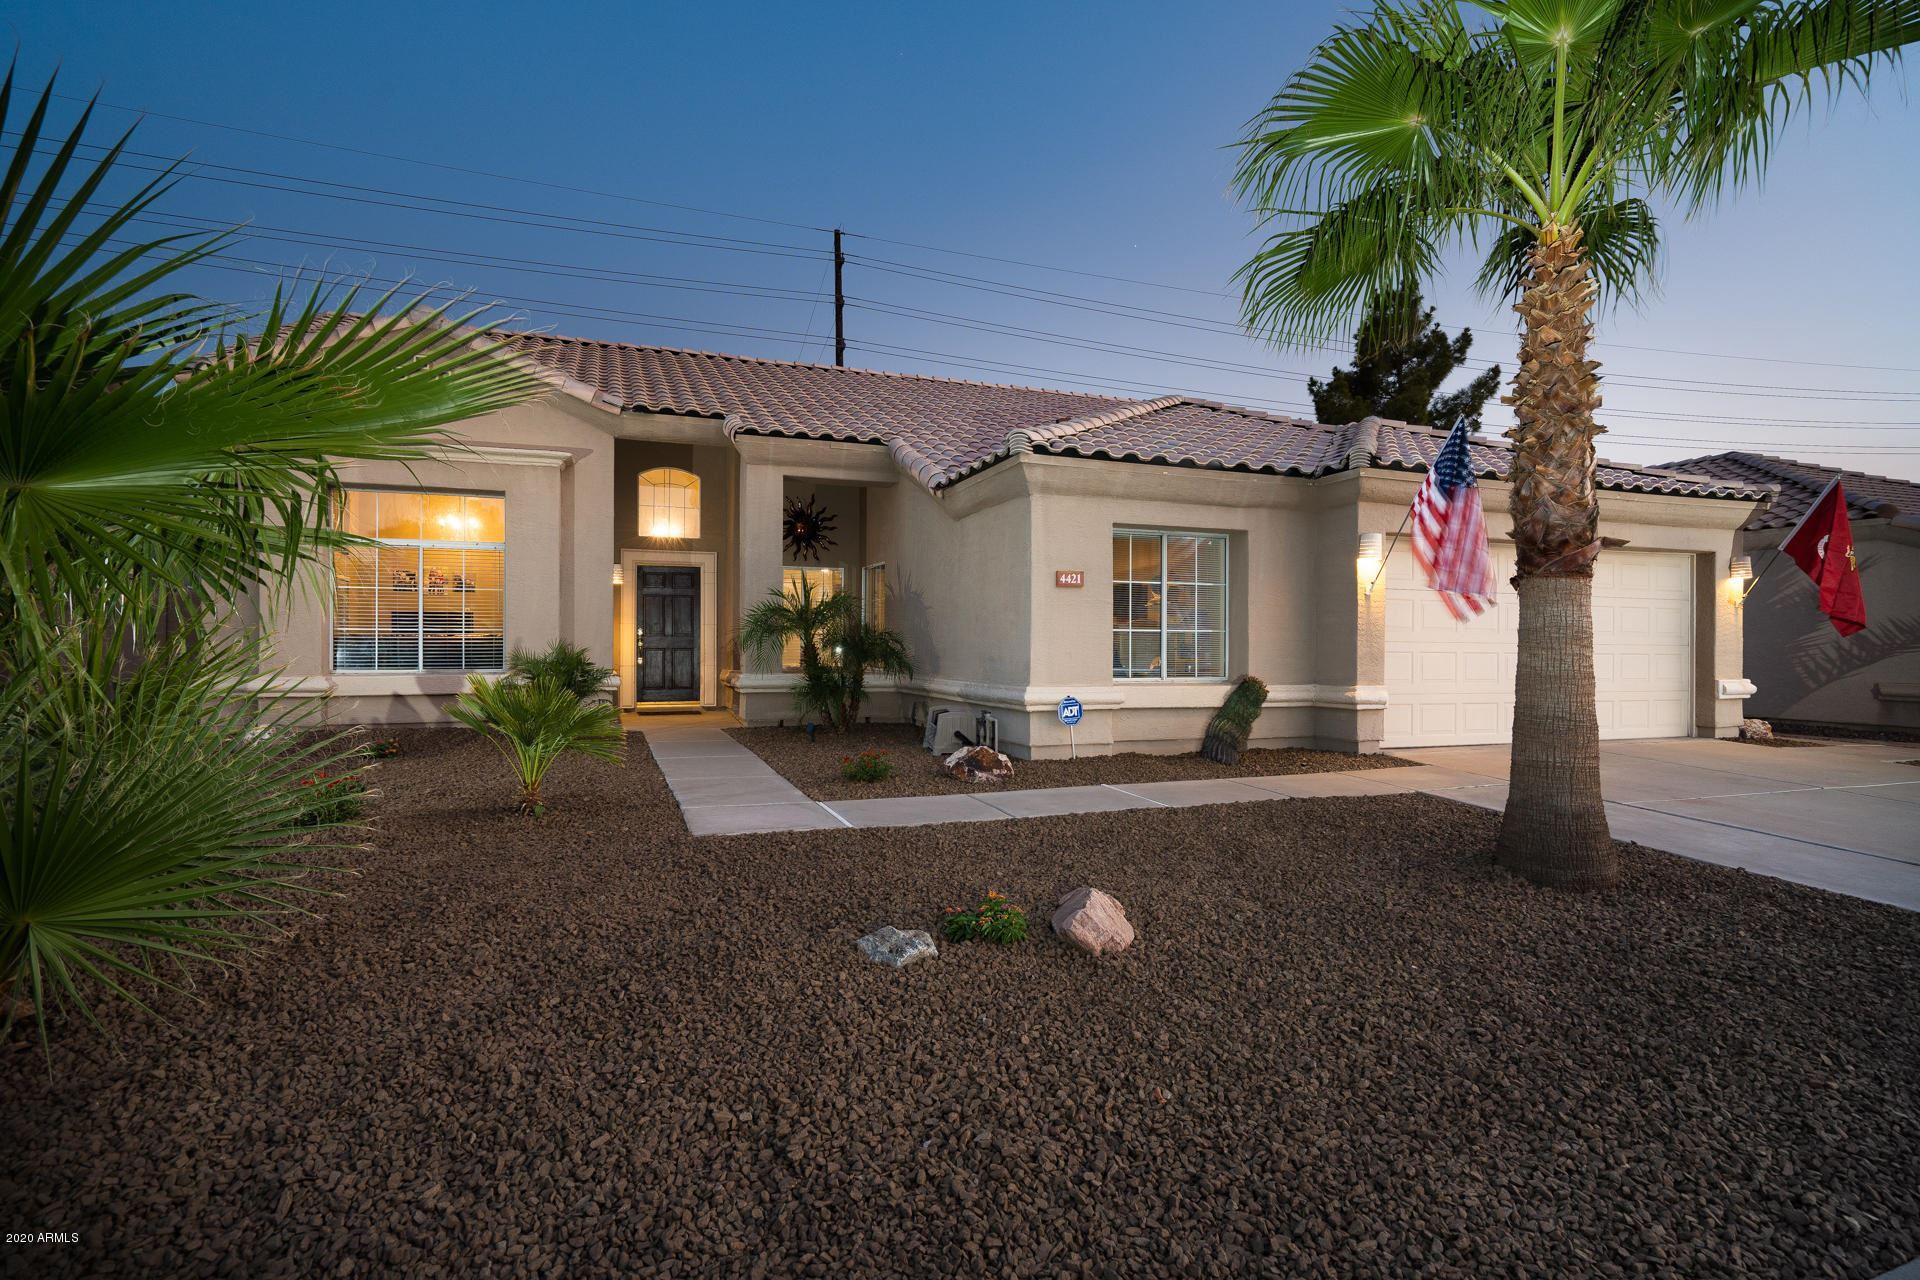 4421 E MOUNTAIN SKY Avenue, Phoenix, AZ 85044 - MLS#: 6134121